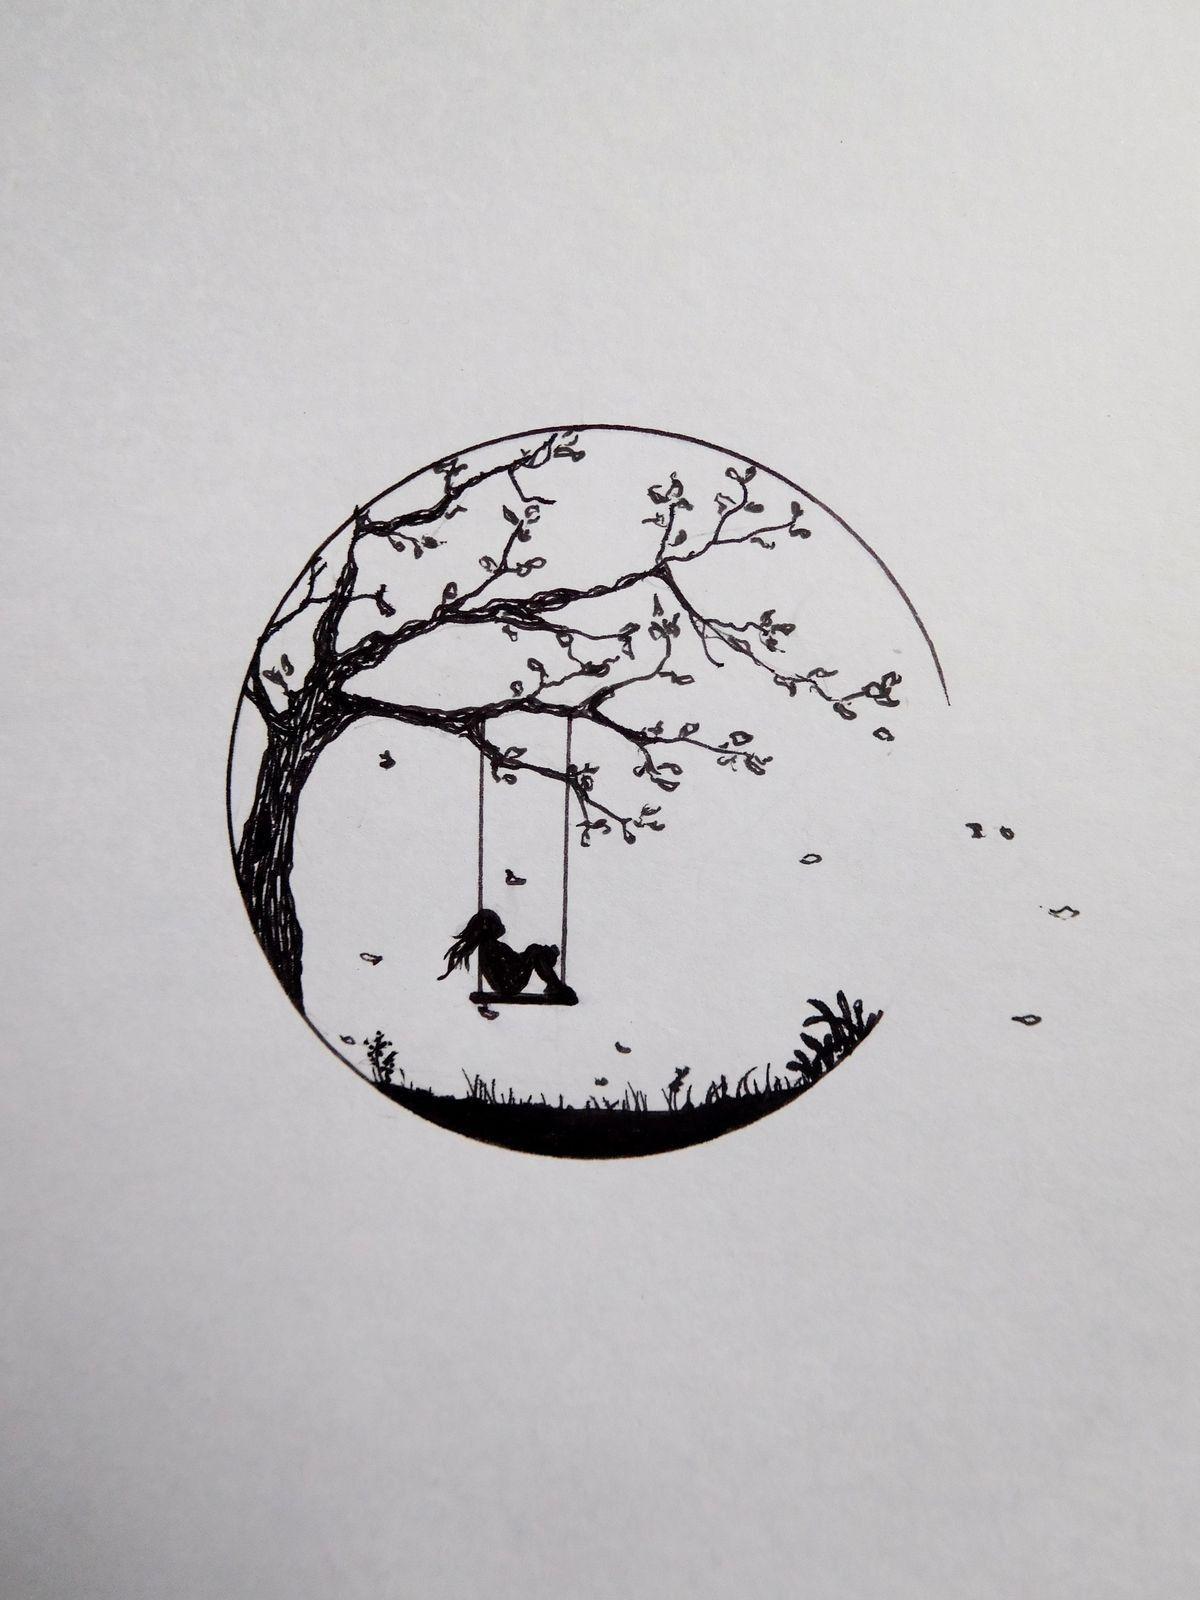 Pin Doa Catarina Pires Em Art Lettering Ideias Para